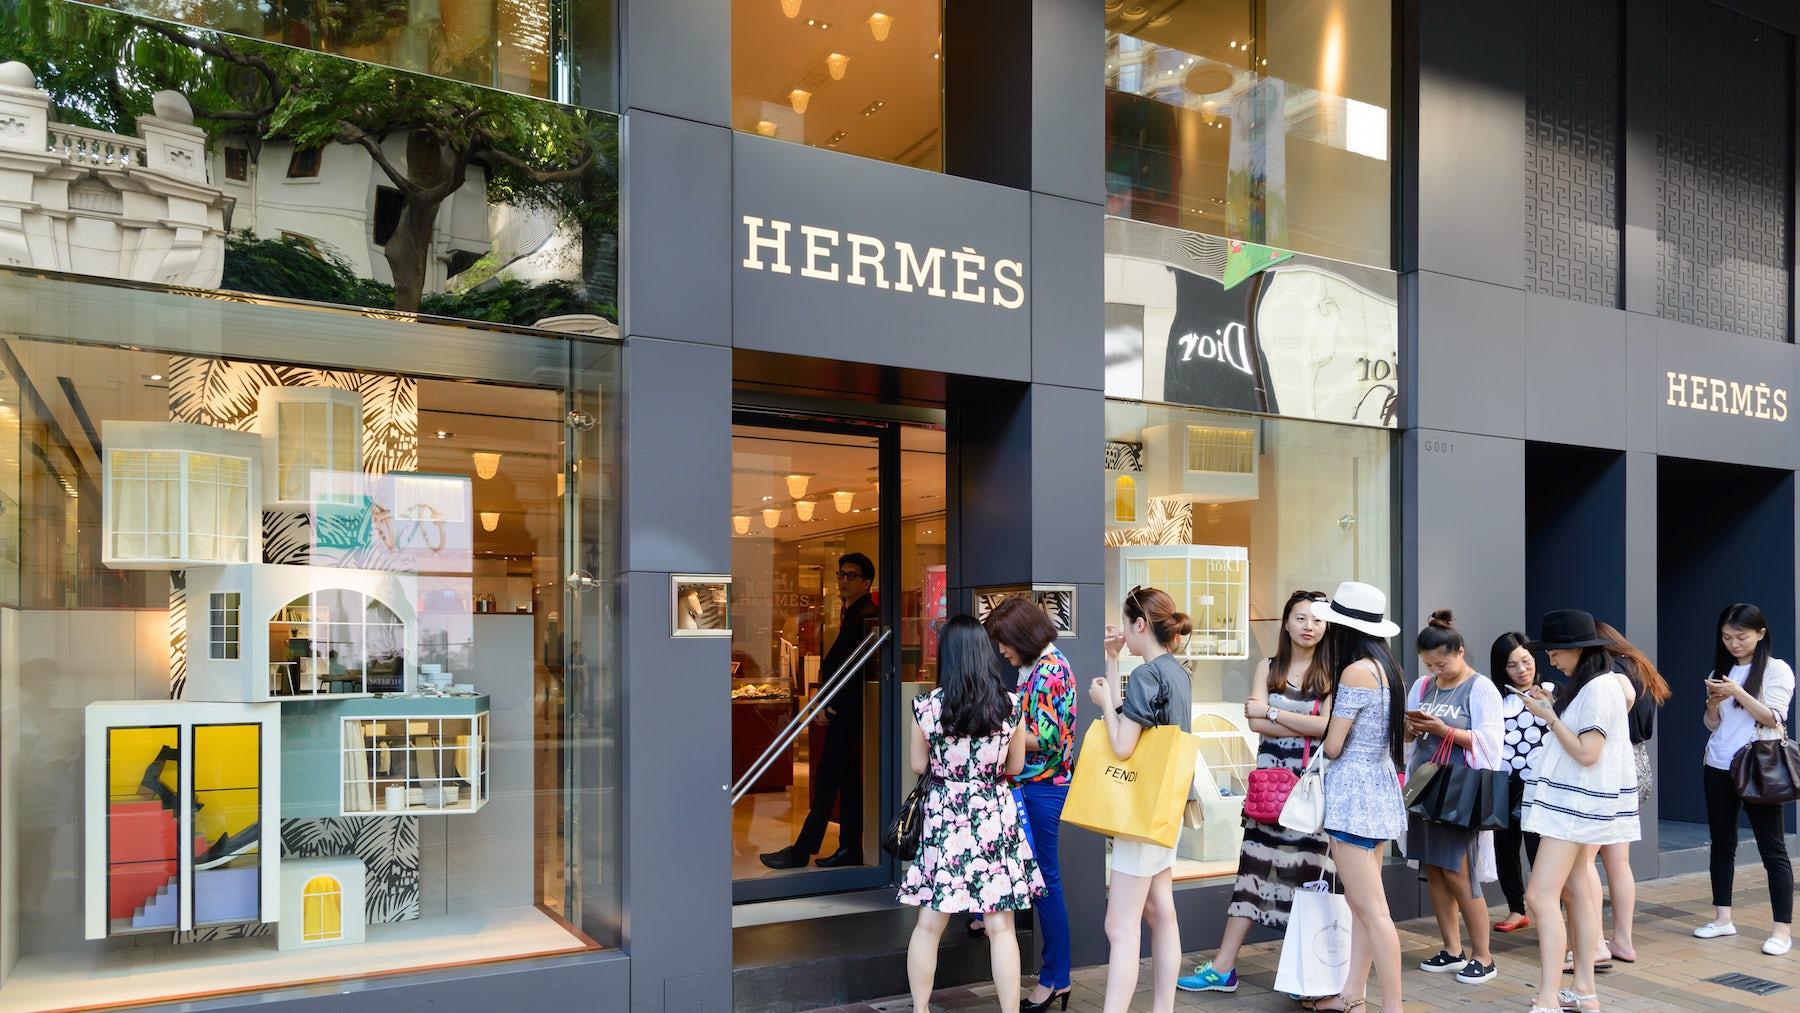 Hermès store, Hong Kong | Source: Shutterstock